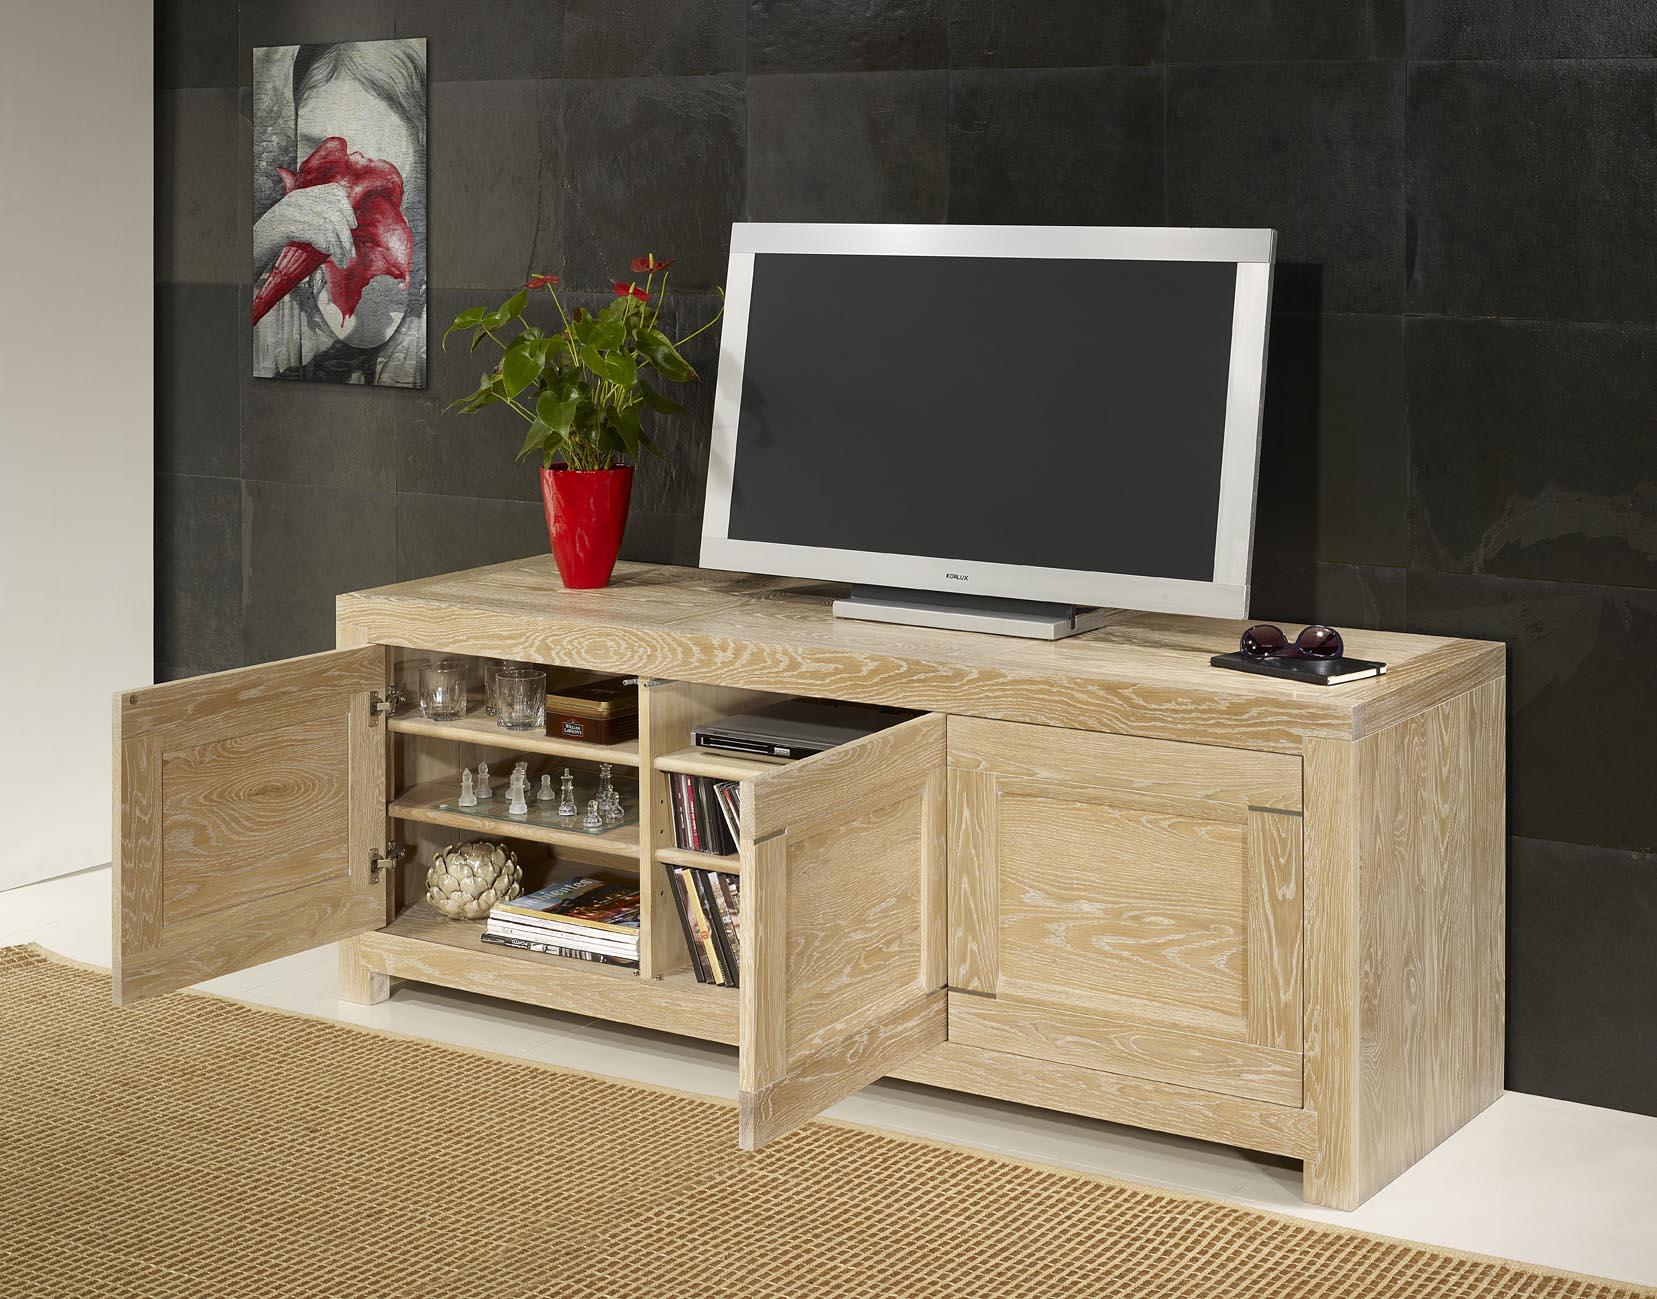 Meuble Tv En Bois Massif Moderne Artzein Com # Table Tele Taille Haute Moderne Chambre